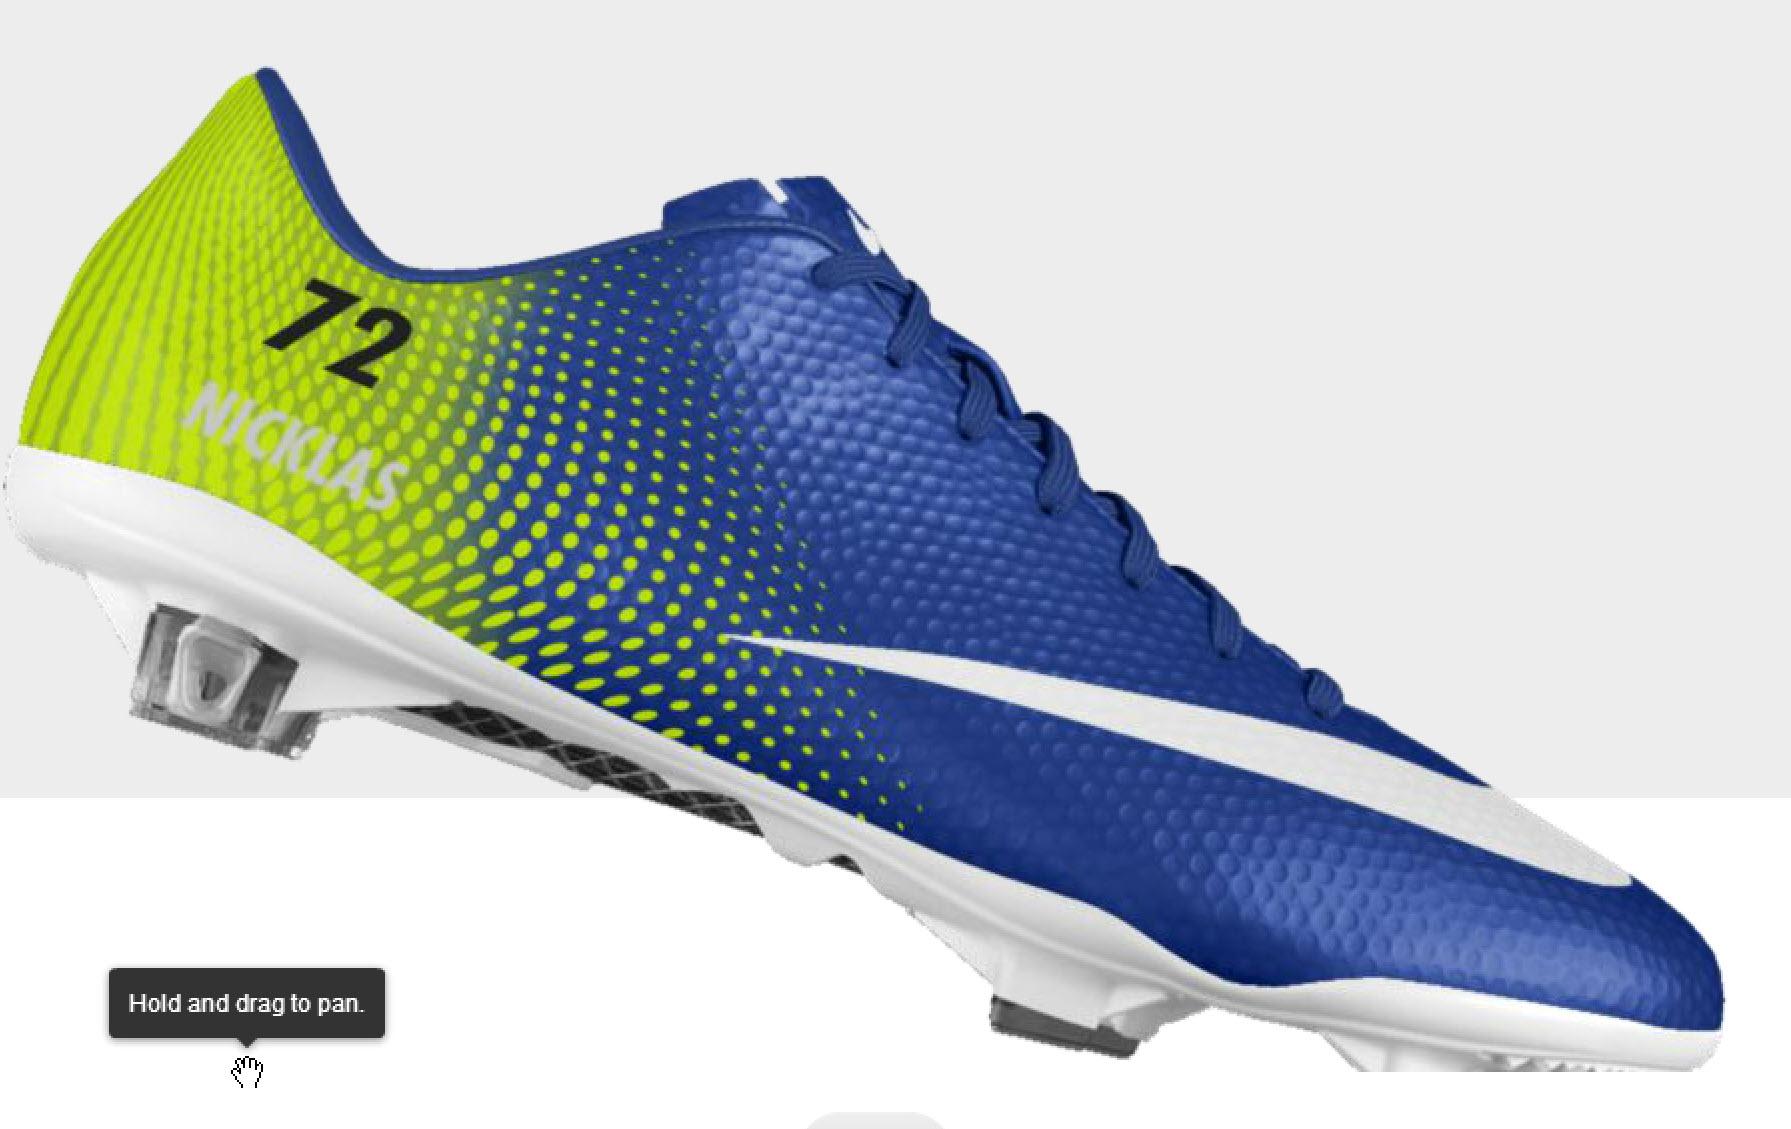 quality design c6e73 b31df Du kan enkelt sätta eget nummer på fotbollsskon via NikeID.